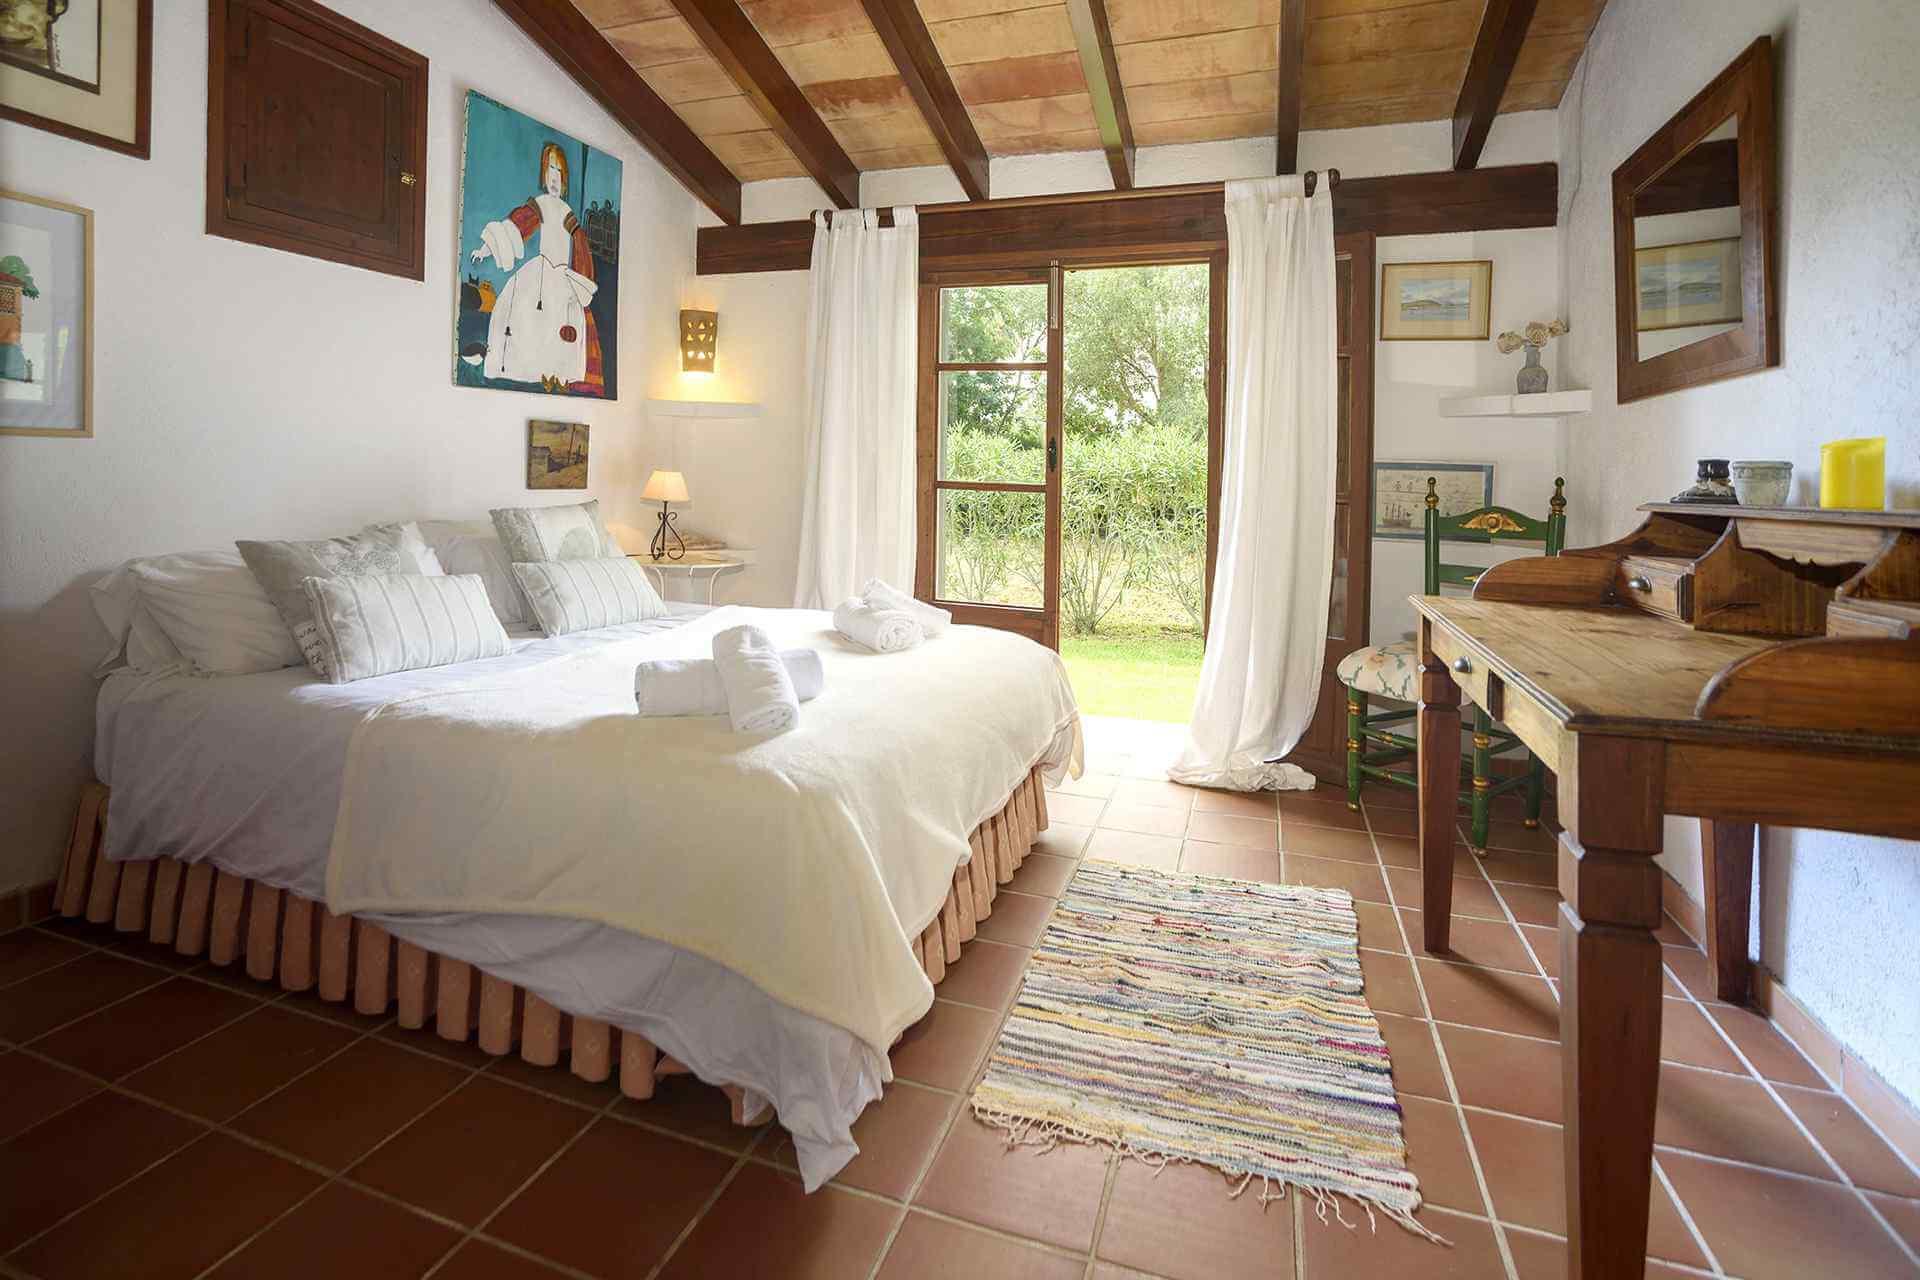 01-161 Finca mit hübschem Garten Mallorca Norden Bild 14